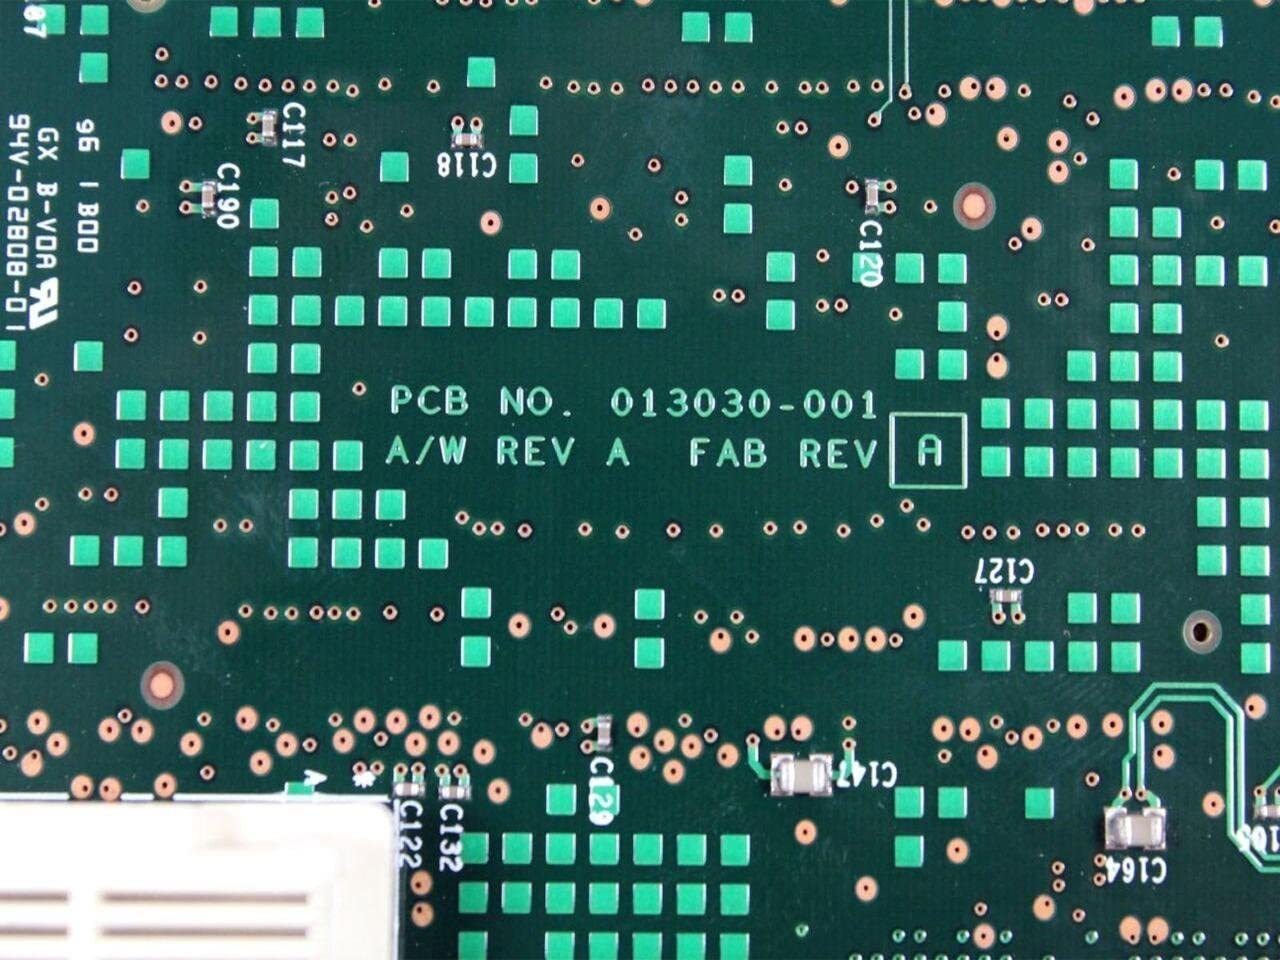 451791-001 HP SMART ARRAY P700M CONTROLLER WITH 512MB RAM PN 451791-001